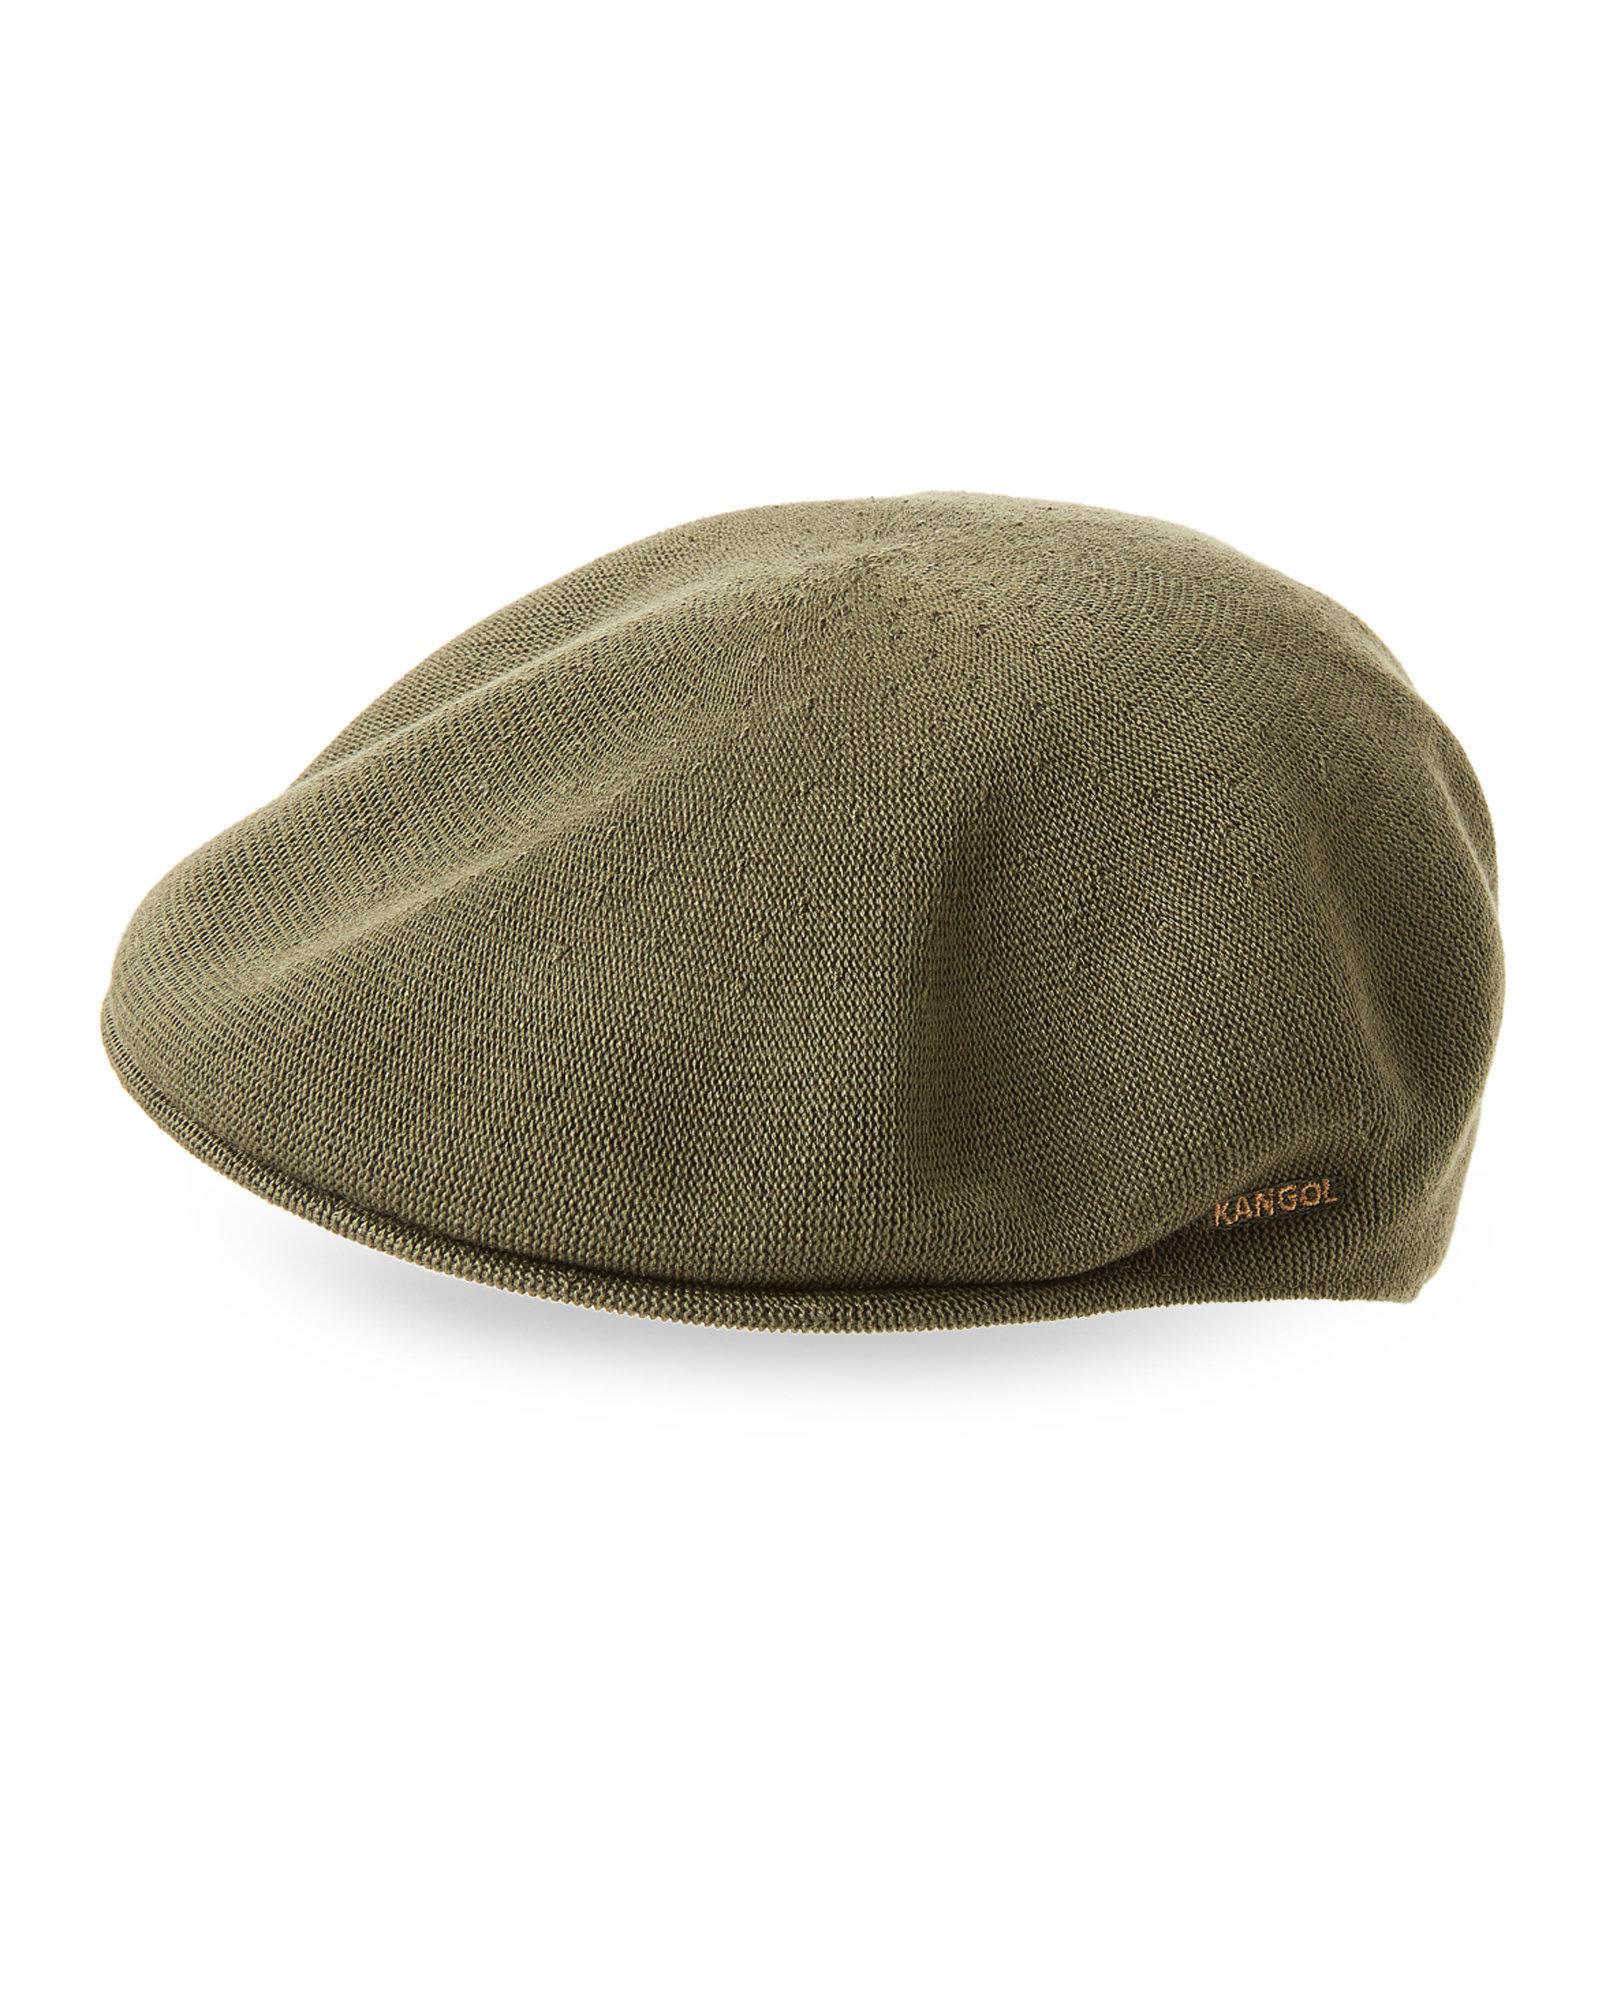 f74a8b1631a Lyst - Kangol Bamboo 504 Ivy Cap in Green for Men